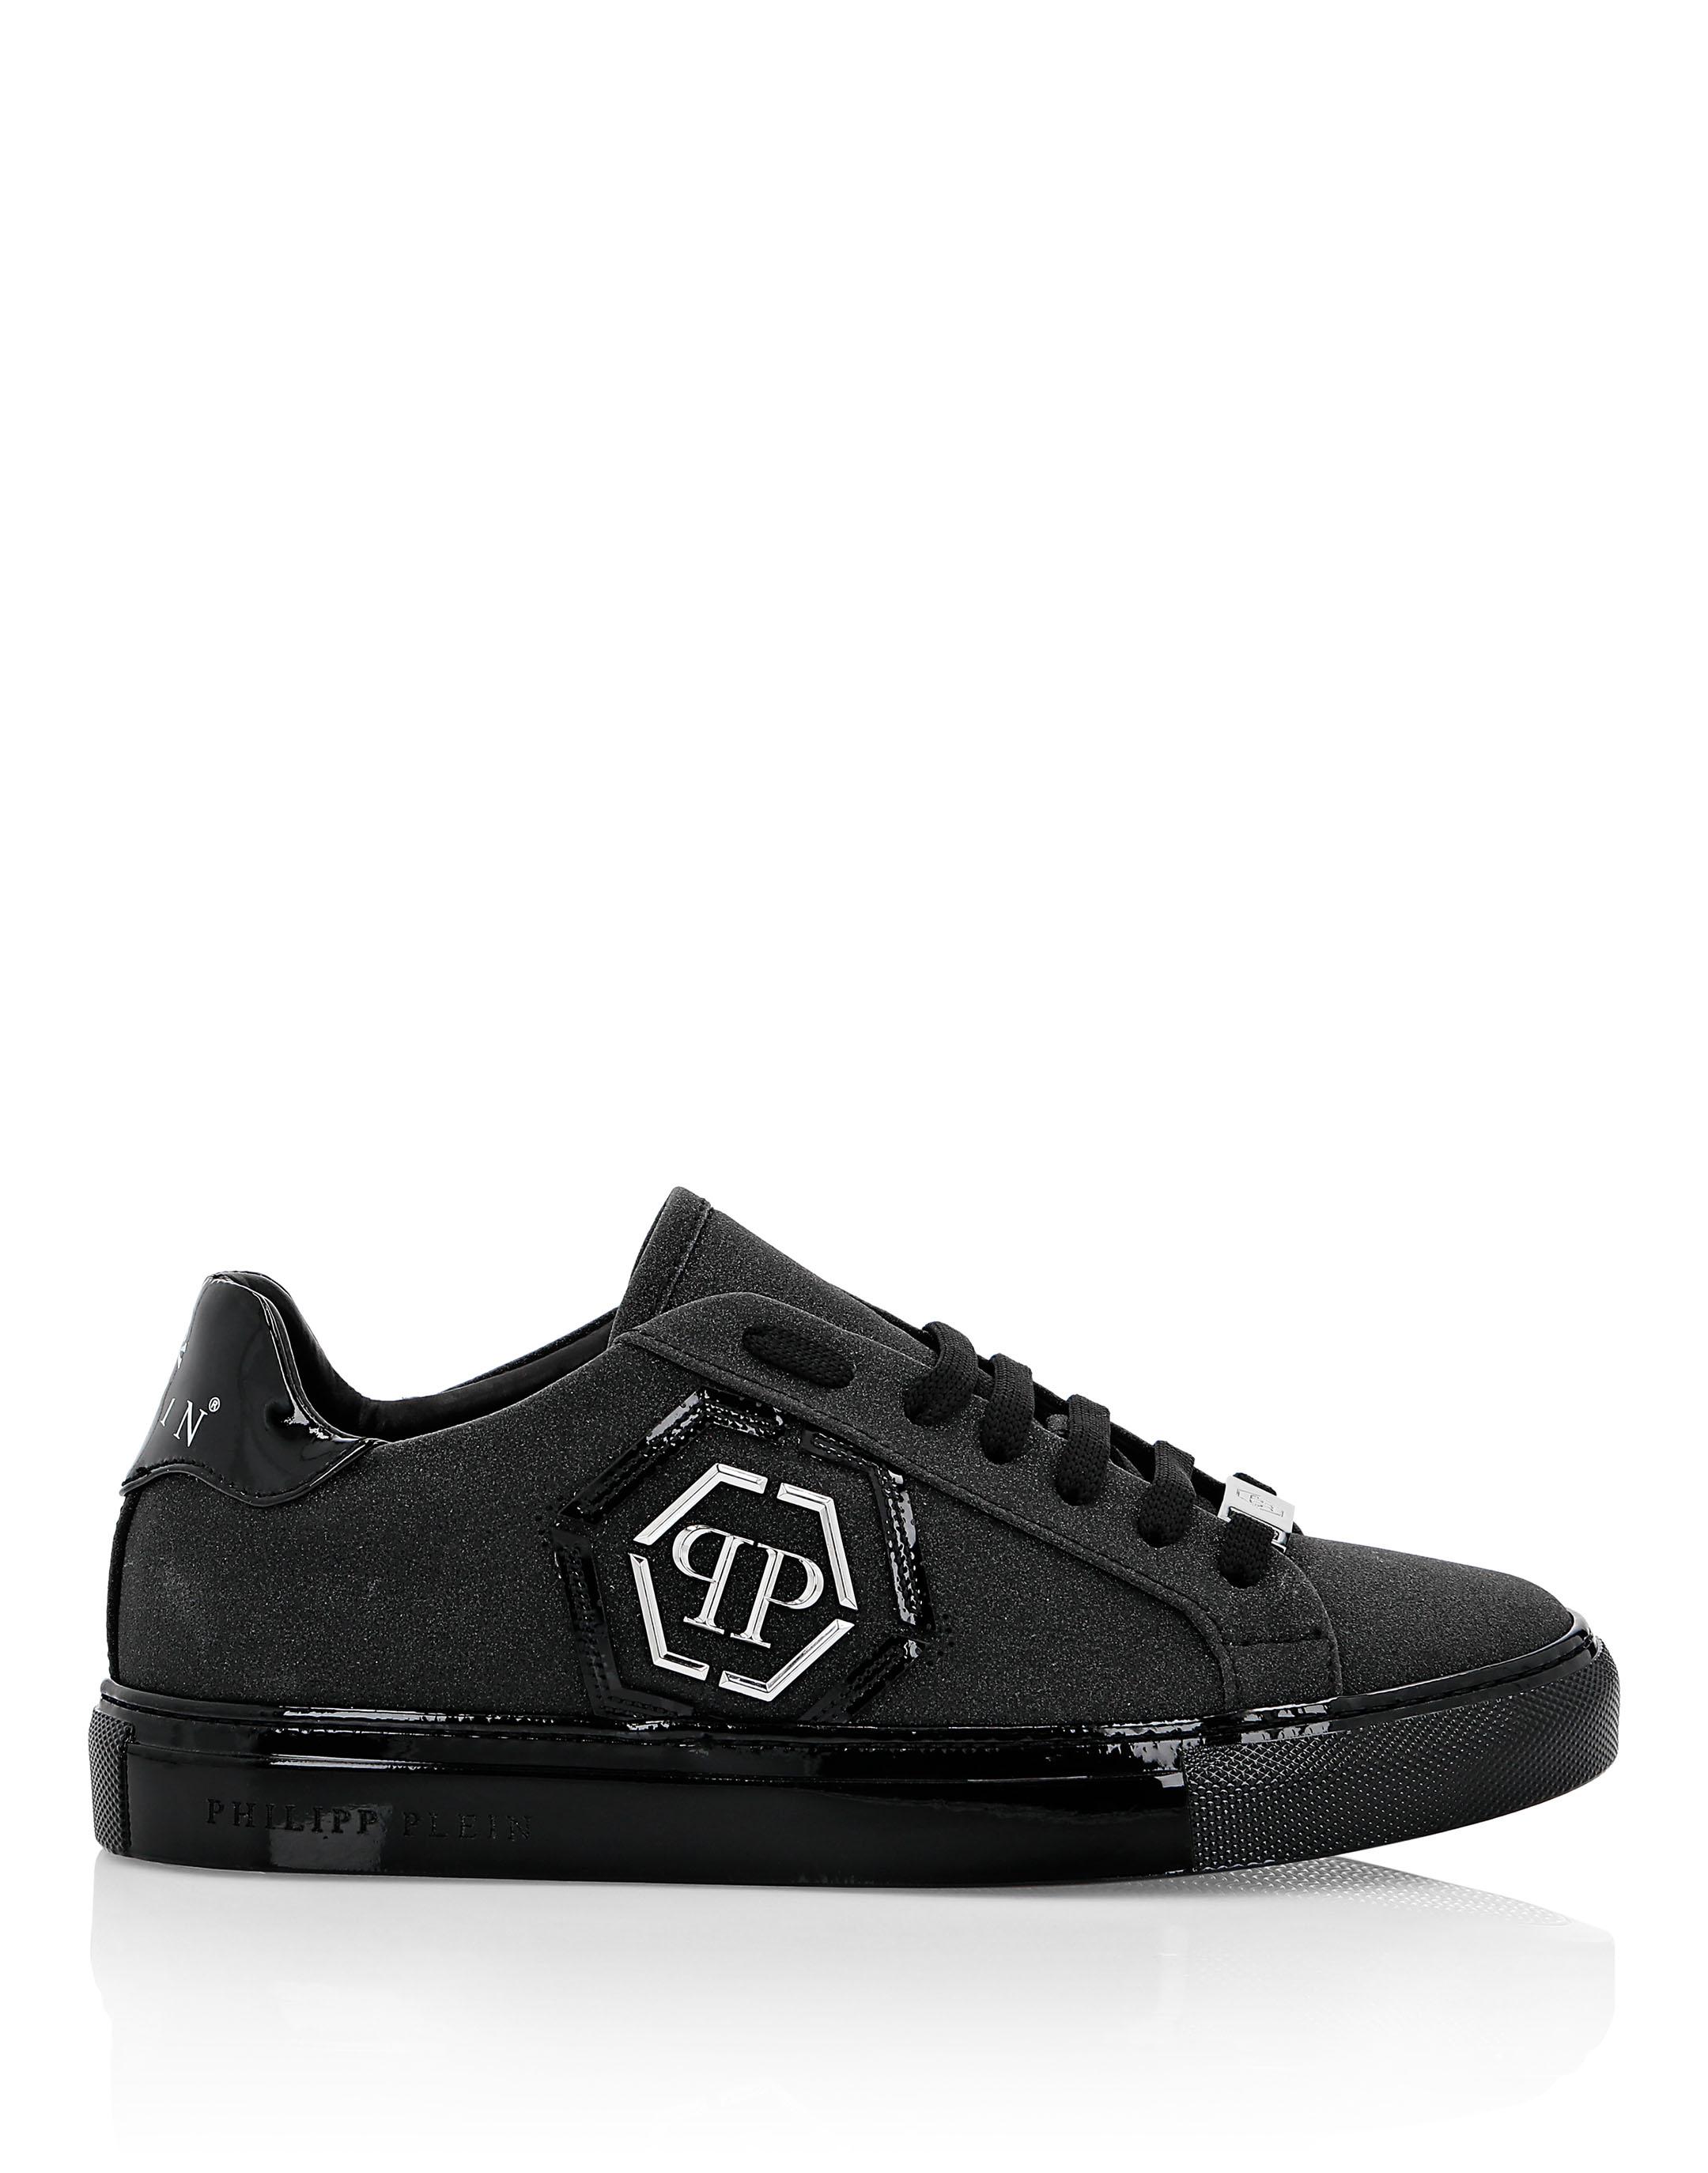 Lo-Top Sneakers Hexagon PP | Philipp Plein